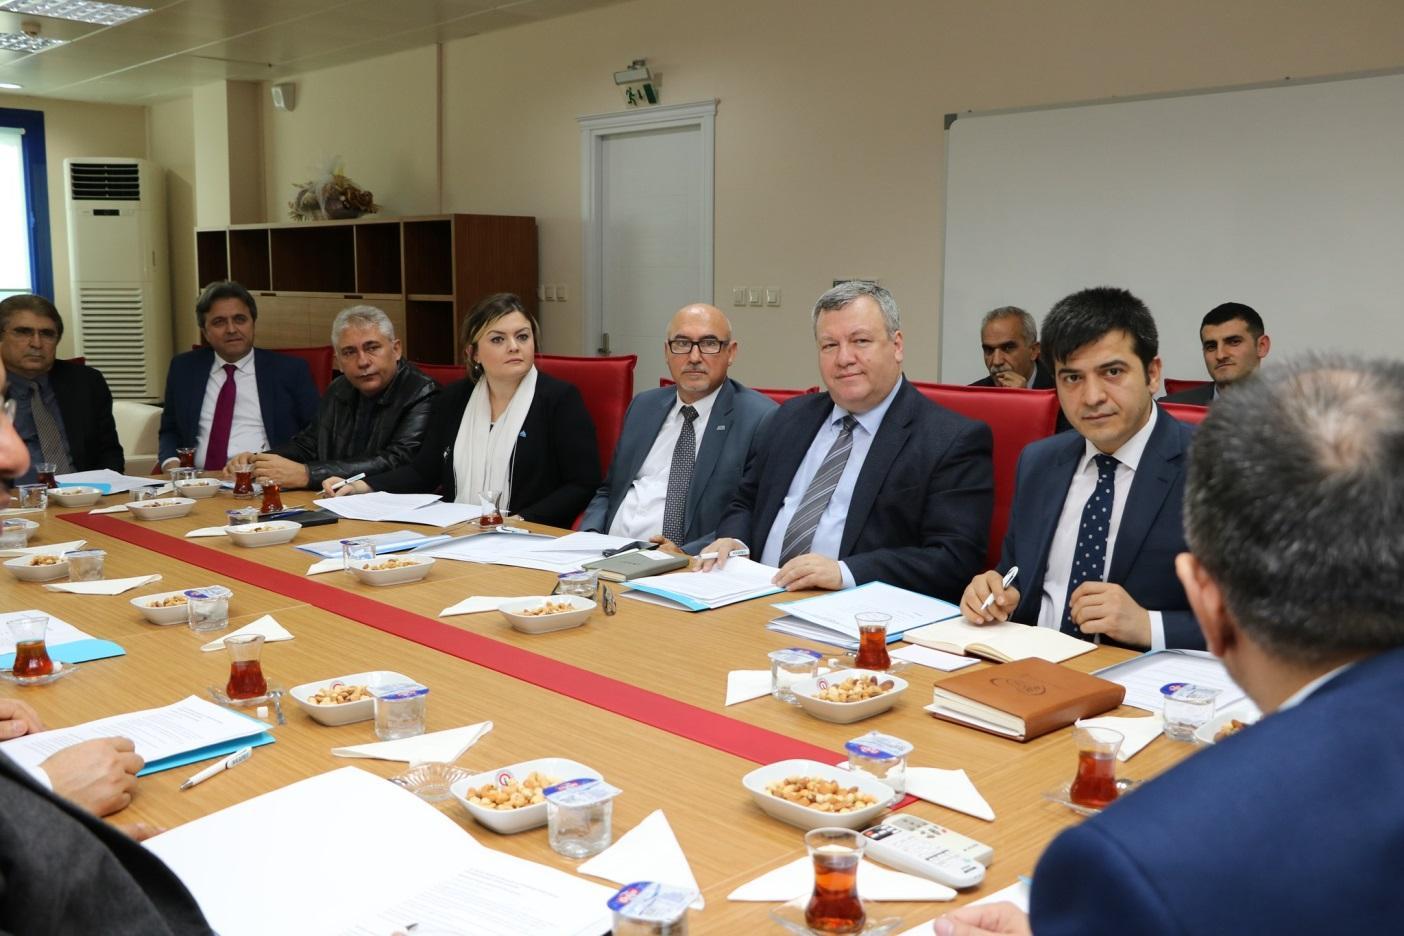 TÜSİAD Başkanı Erol Bilecik, HİKAF'a katılacak